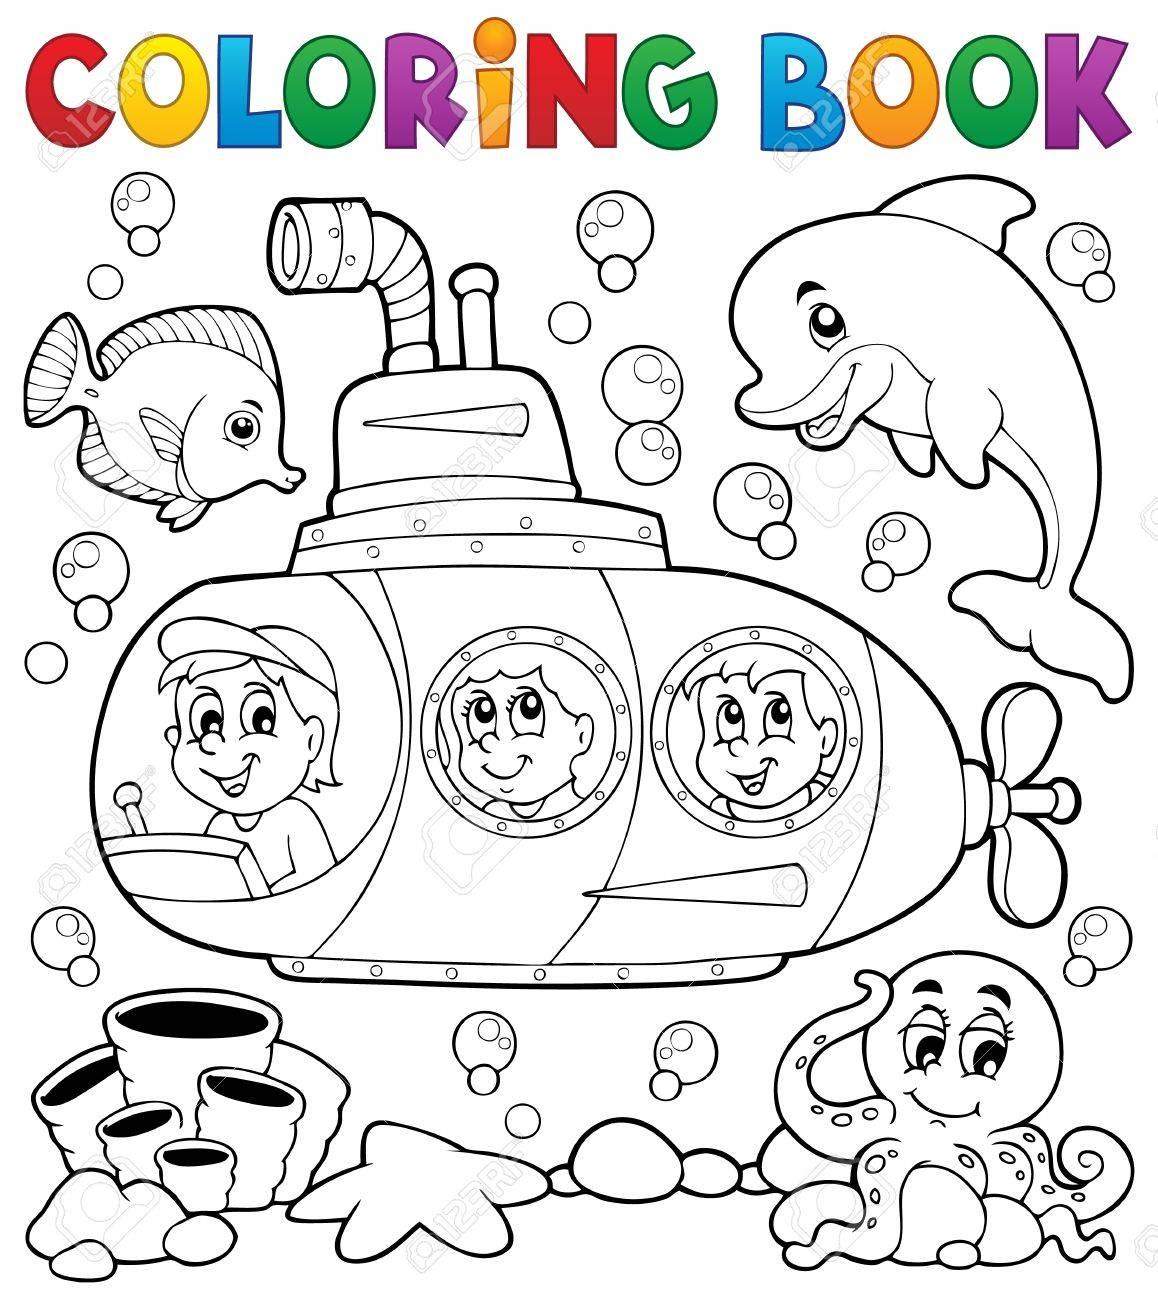 Coloring book submarine theme Stock Vector - 38471330